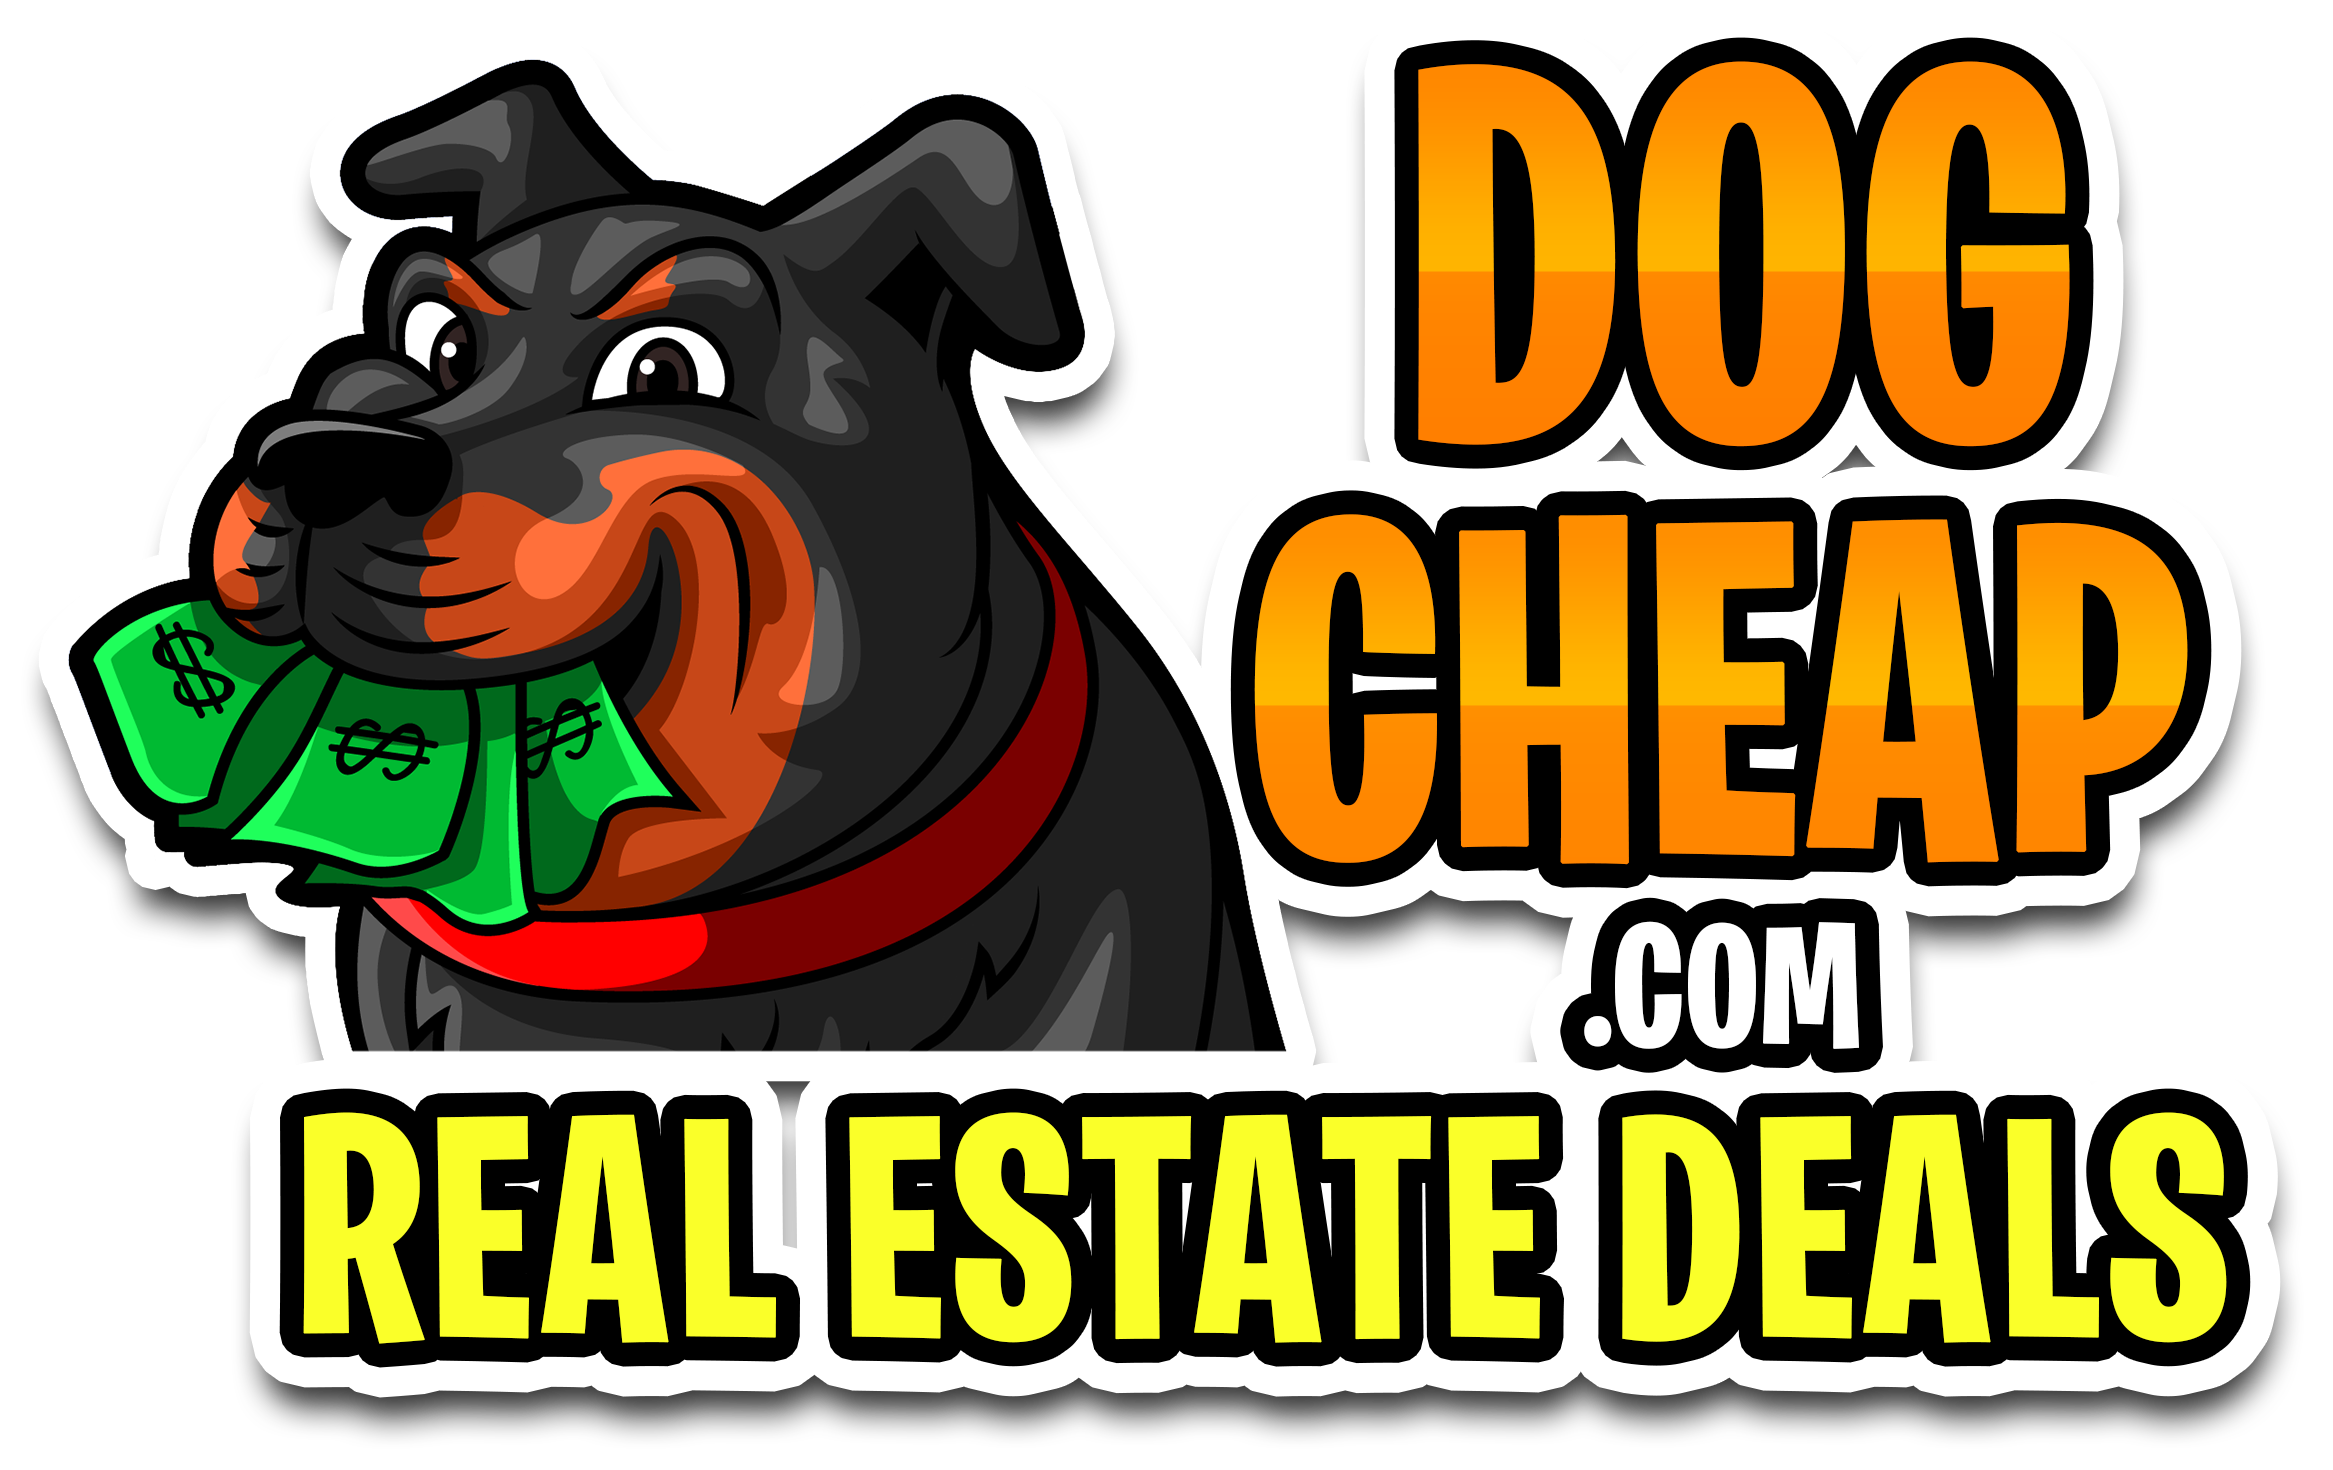 DogCheap.com